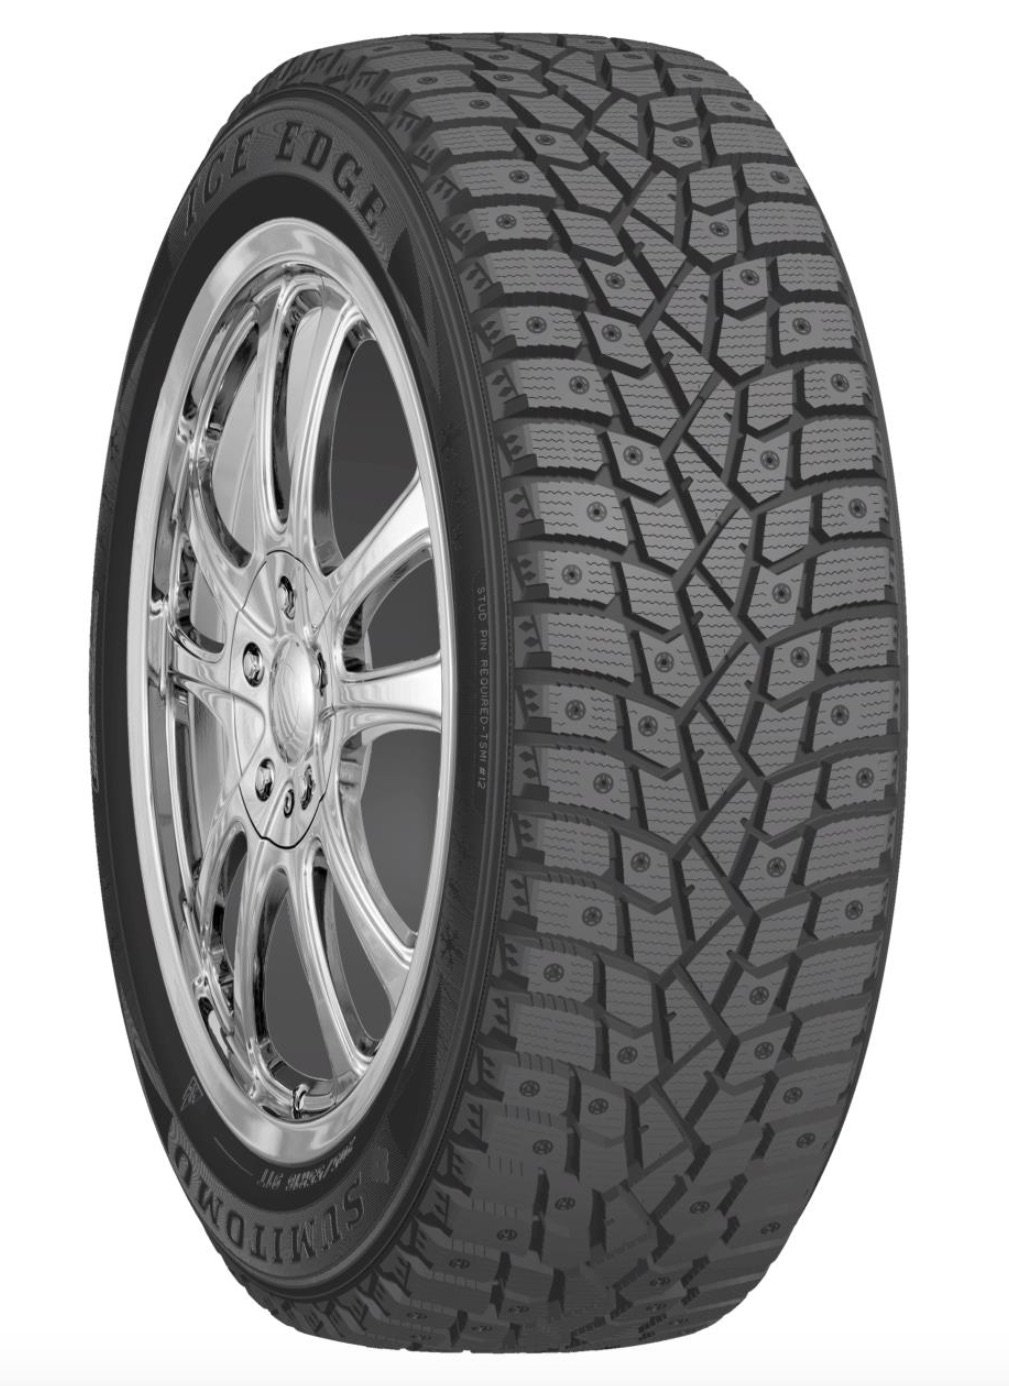 Sumitomo Ice Edge Studable-Winter Radial Tire - 225/50R17 94T